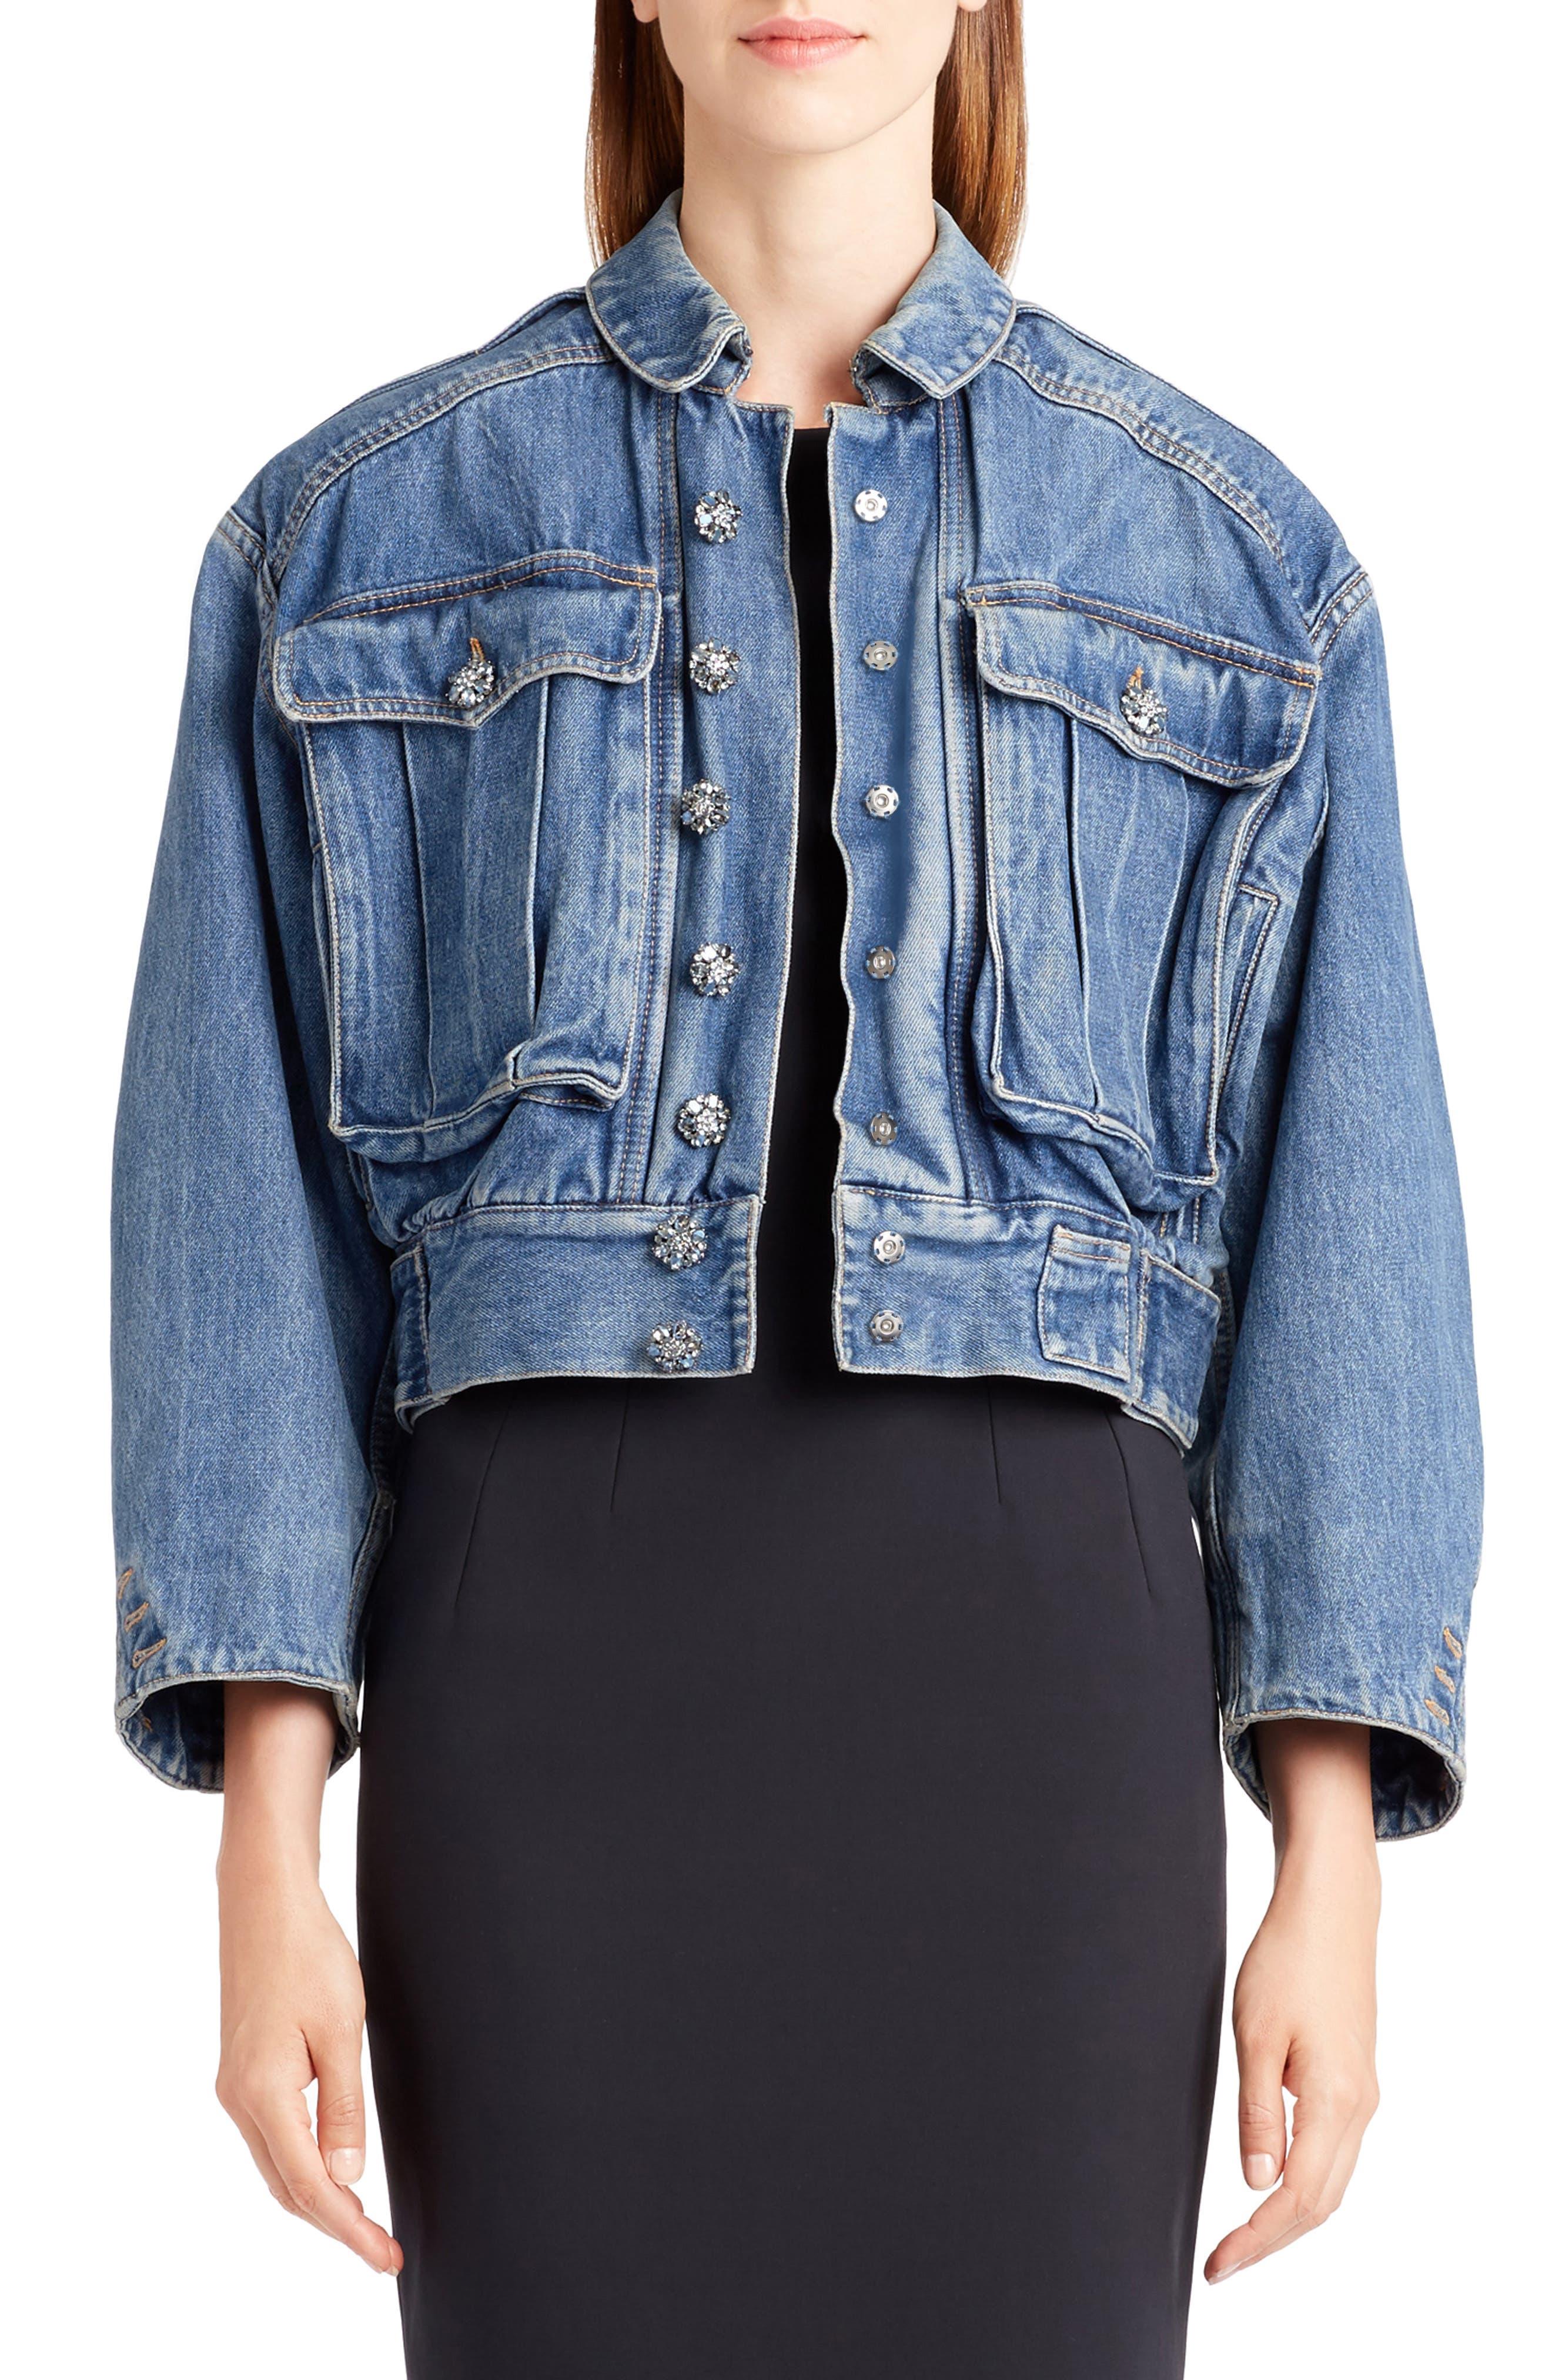 DOLCE&GABBANA Oversize Denim Jacket